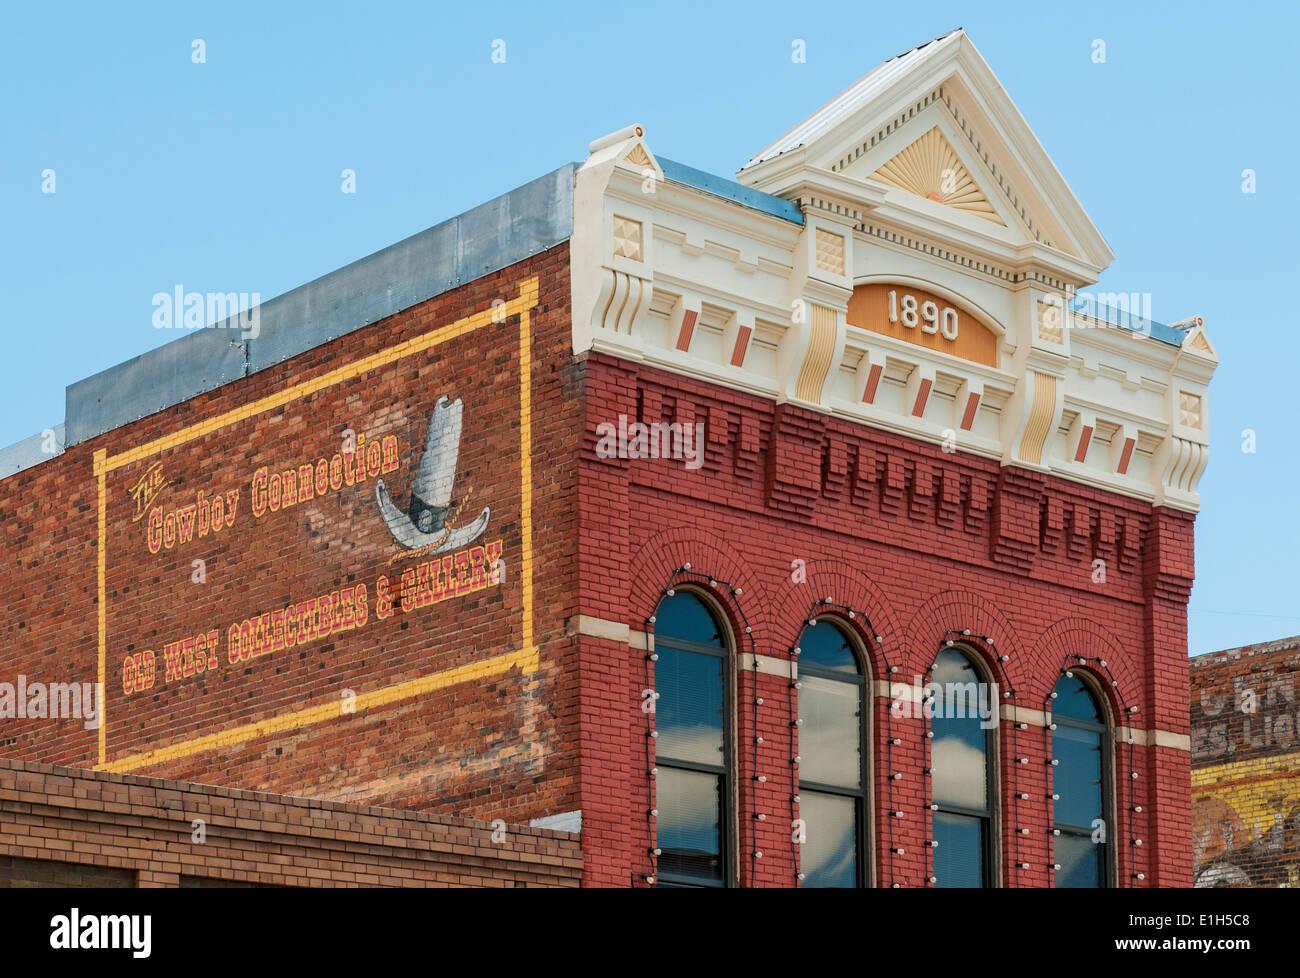 Montana, Livingston, Downtown, historic 1890 building Stock Photo